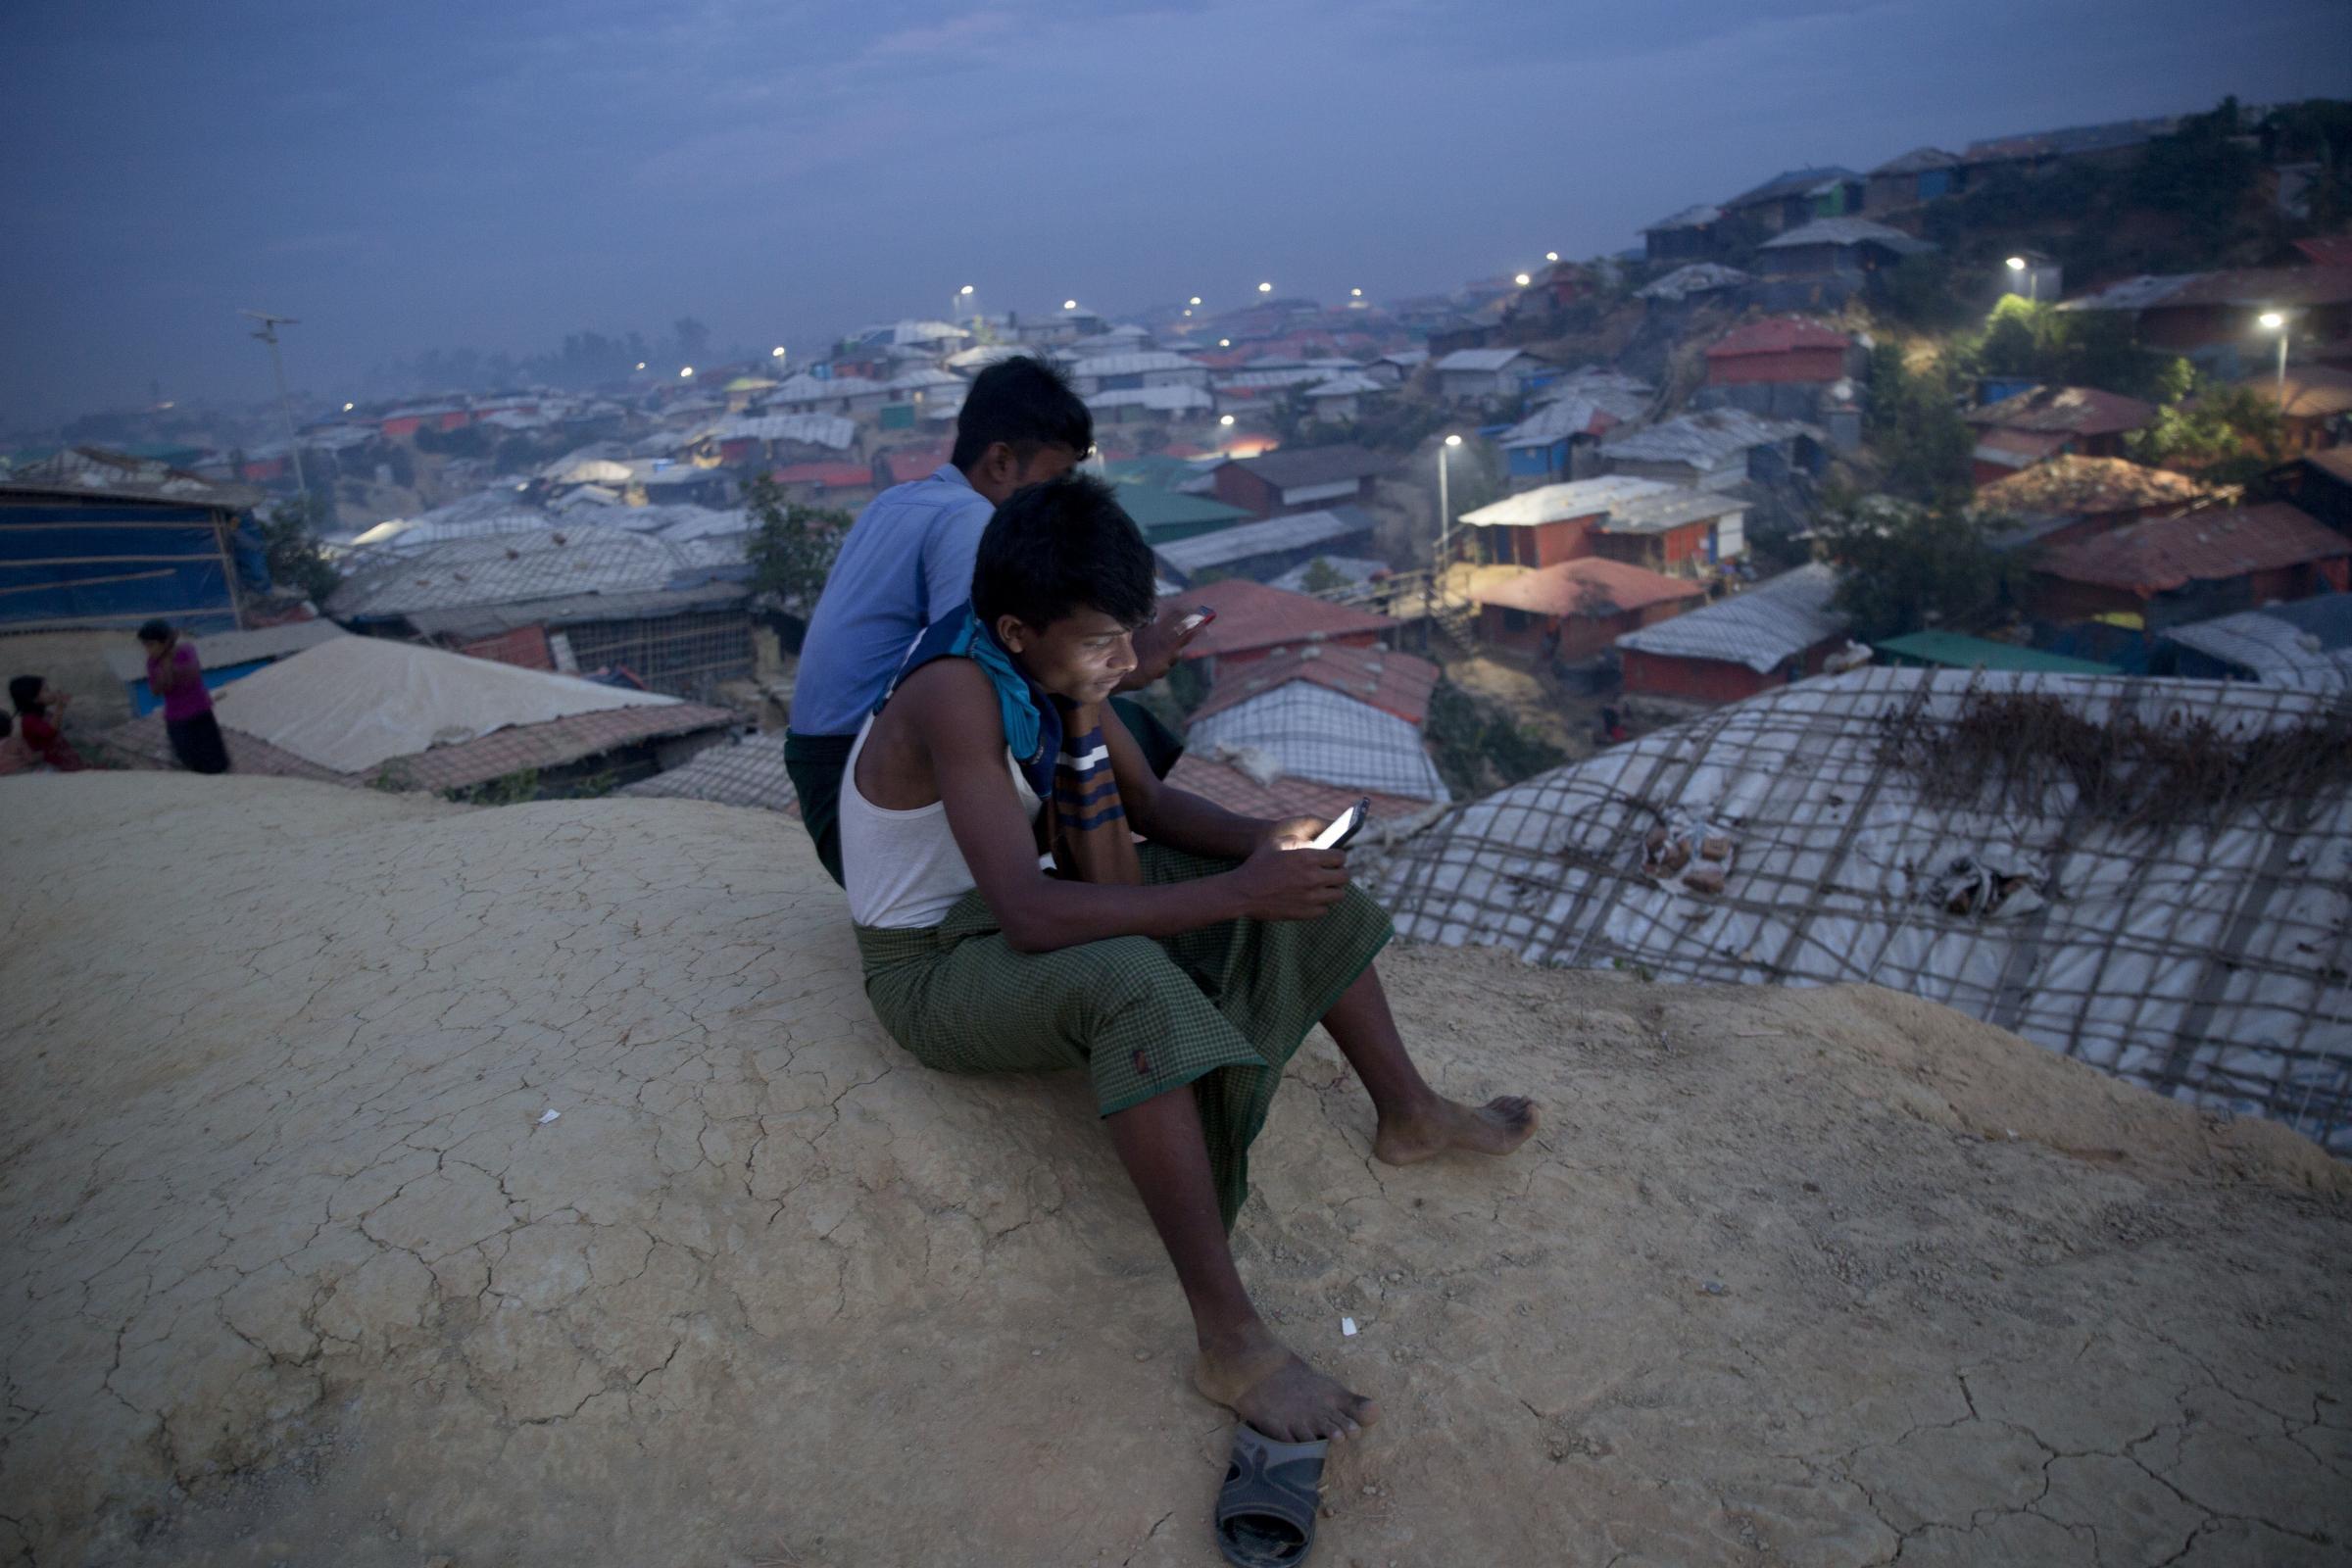 Bangladesh says it is ready to repatriate Rohingya refugees to Burma